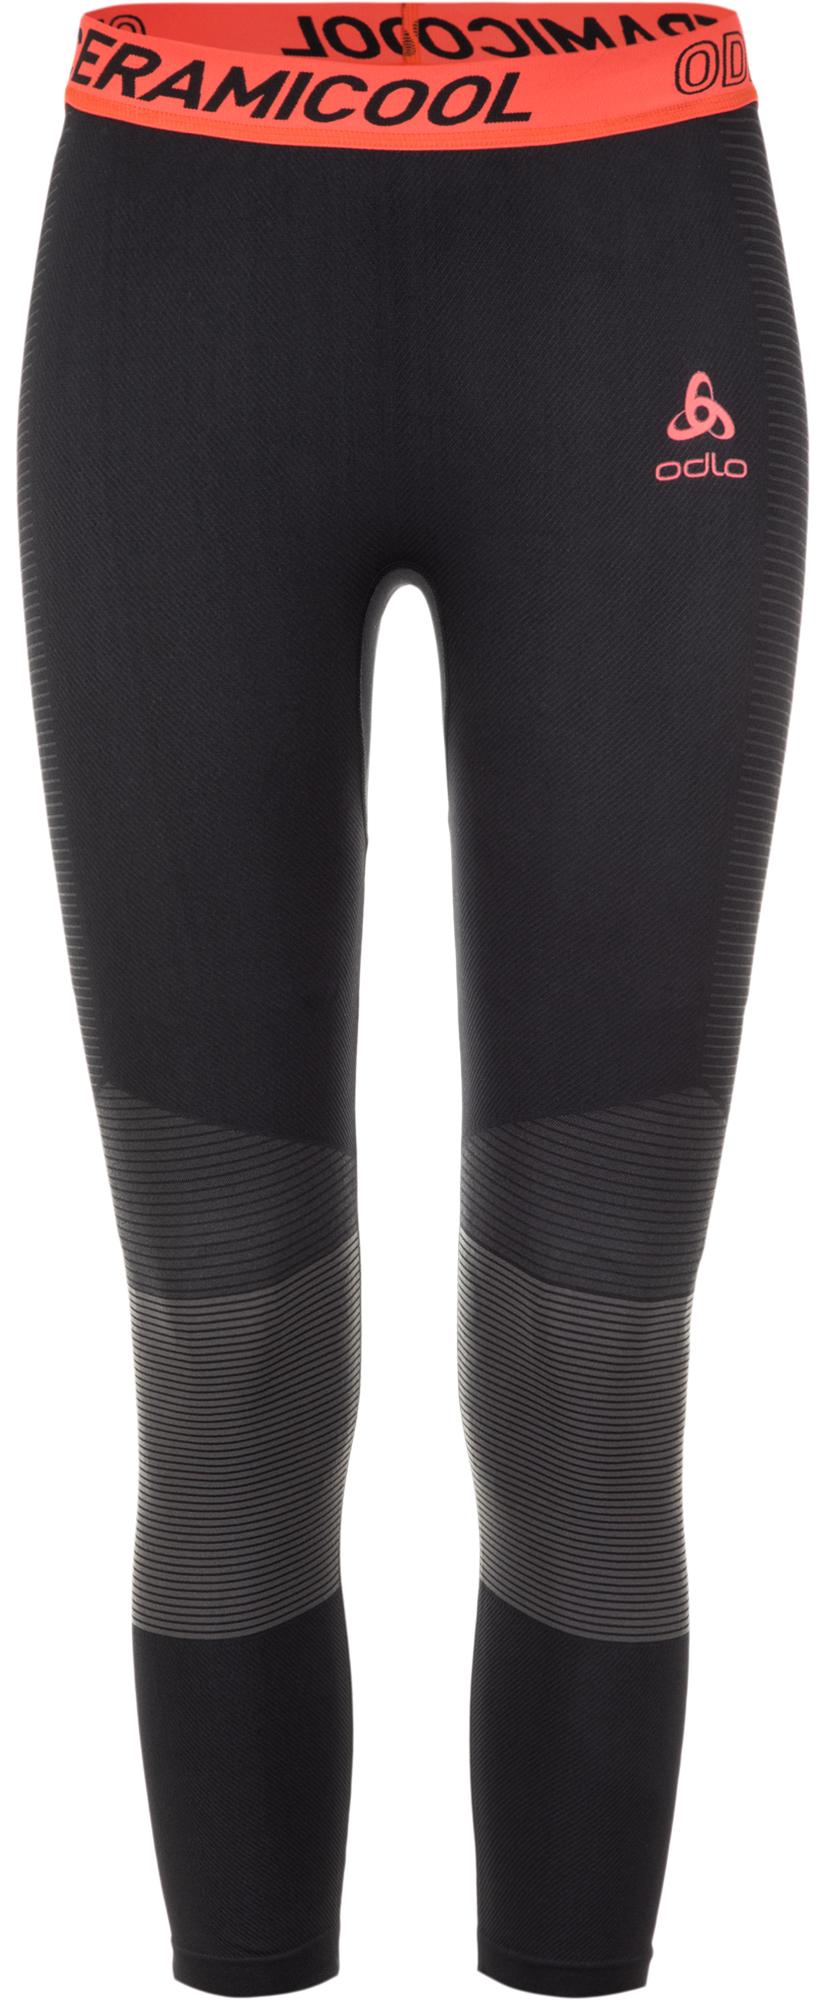 Odlo Легинсы женские Odlo Ceramicool Motion, размер 44-46 odlo шорты женские odlo 2 в 1 zeroweih размер 42 44